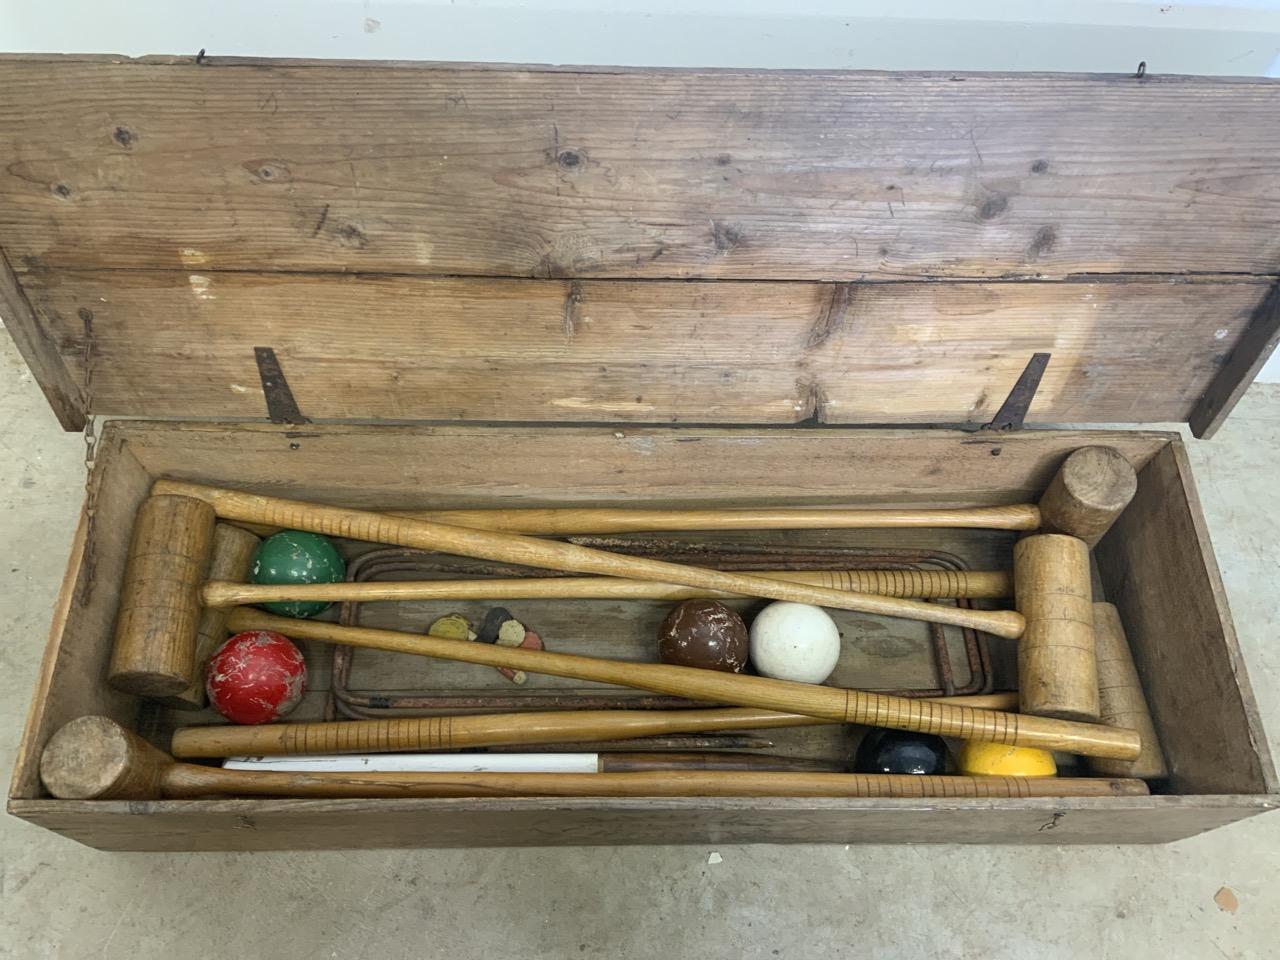 A vintage boxed Jacques croquet set, including six mallets, six hoops, six balls W:105cm x D:36cm - Image 3 of 3